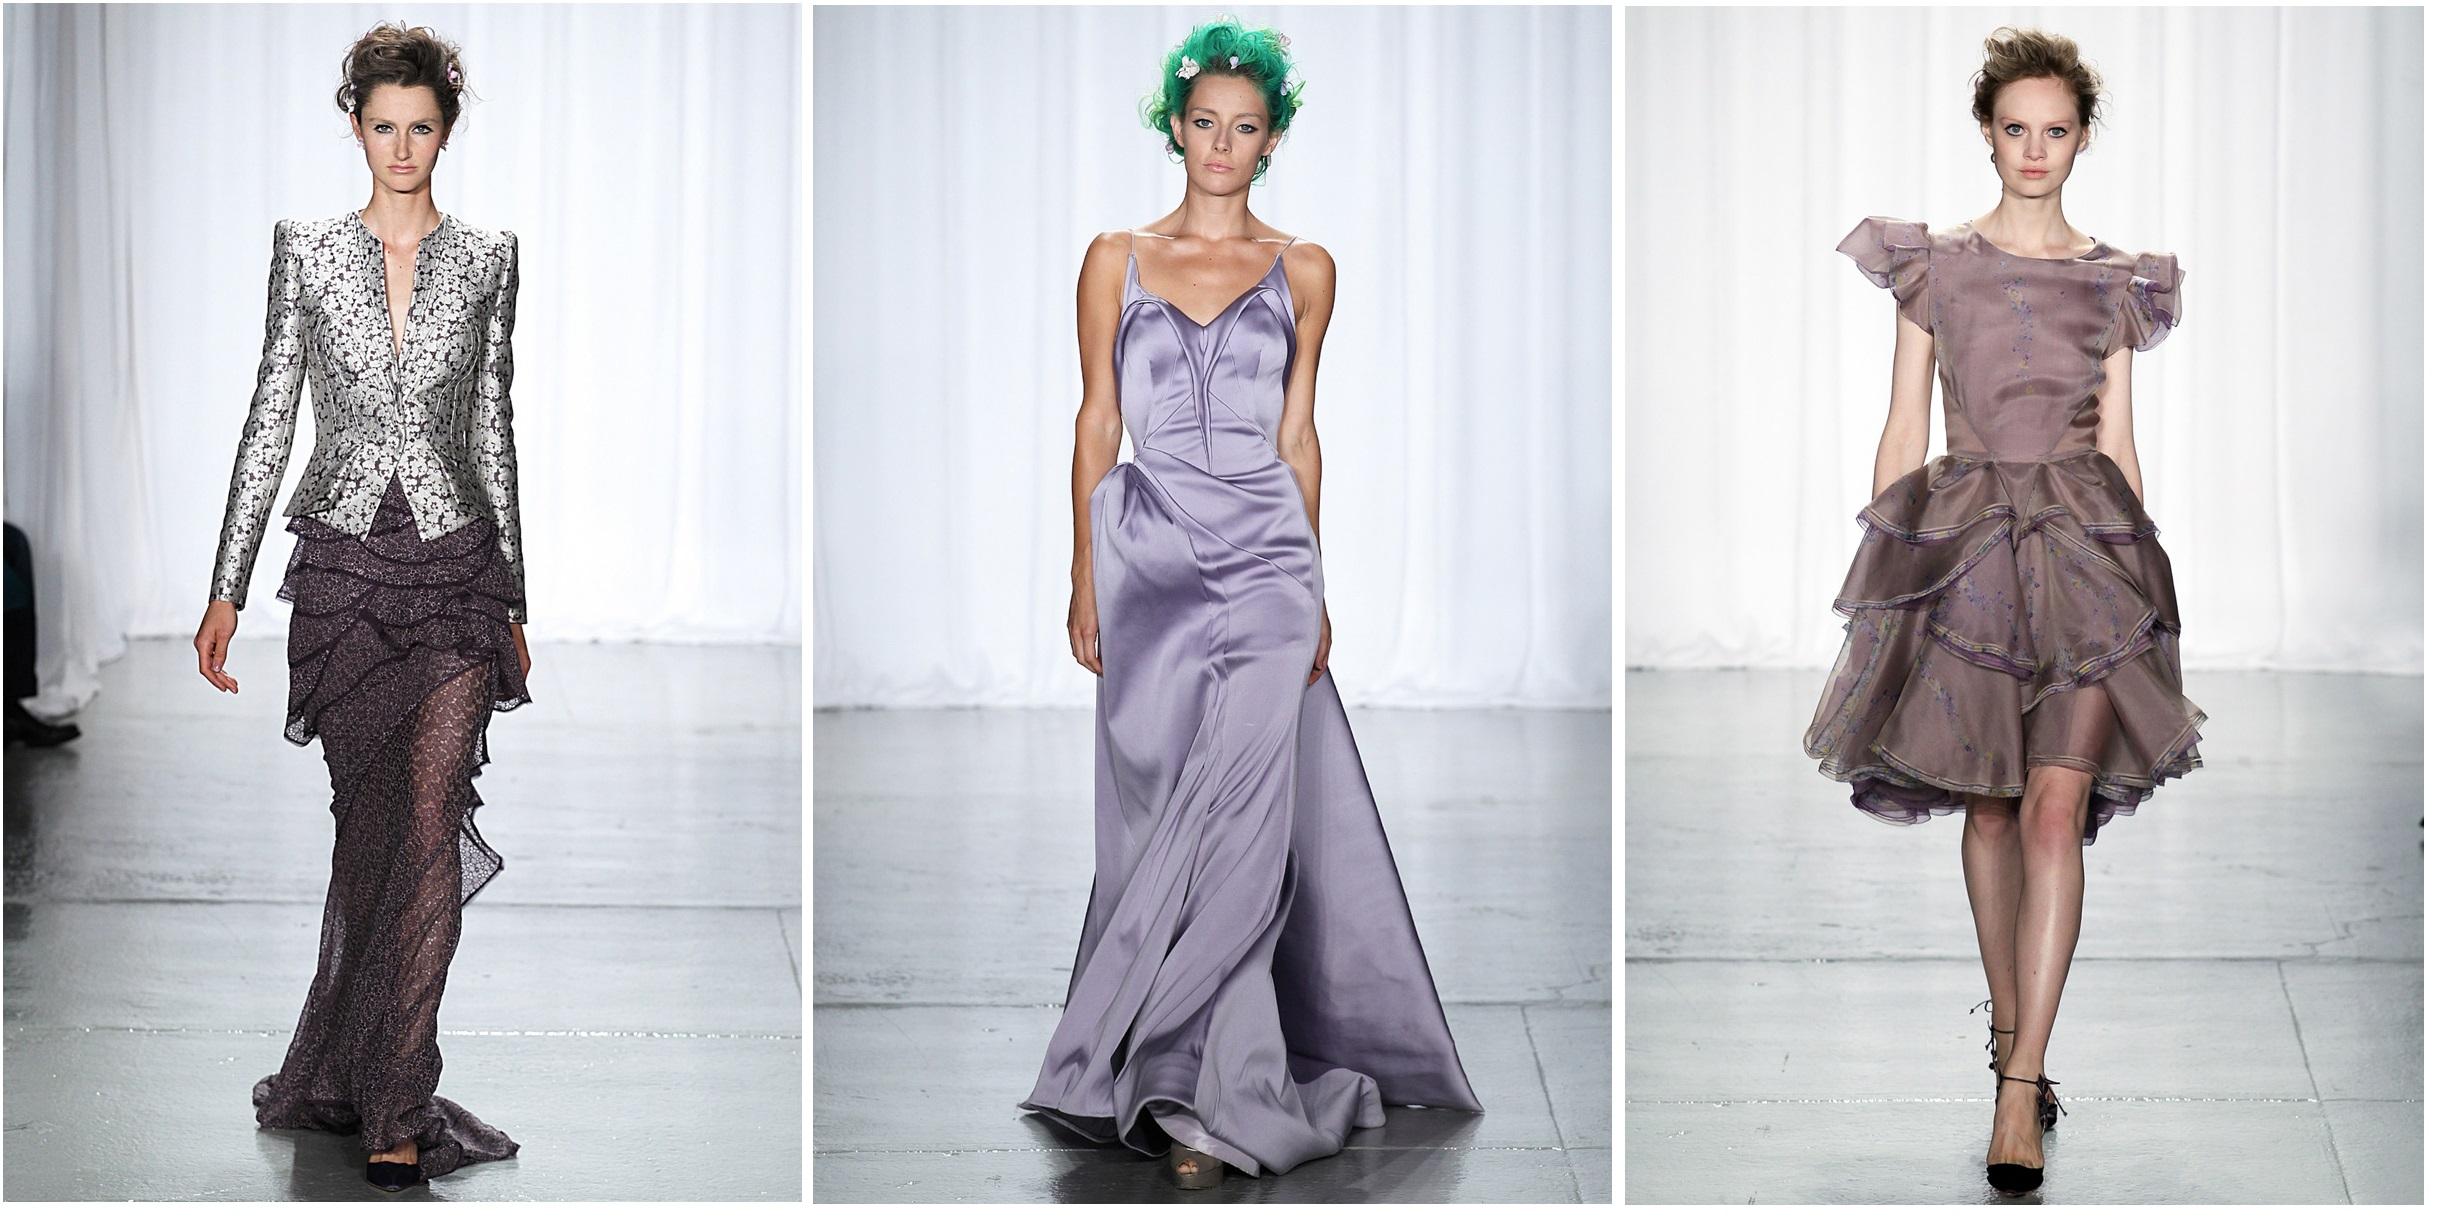 Zac Posen Spring 2014 Collection New York Fashion Week 2